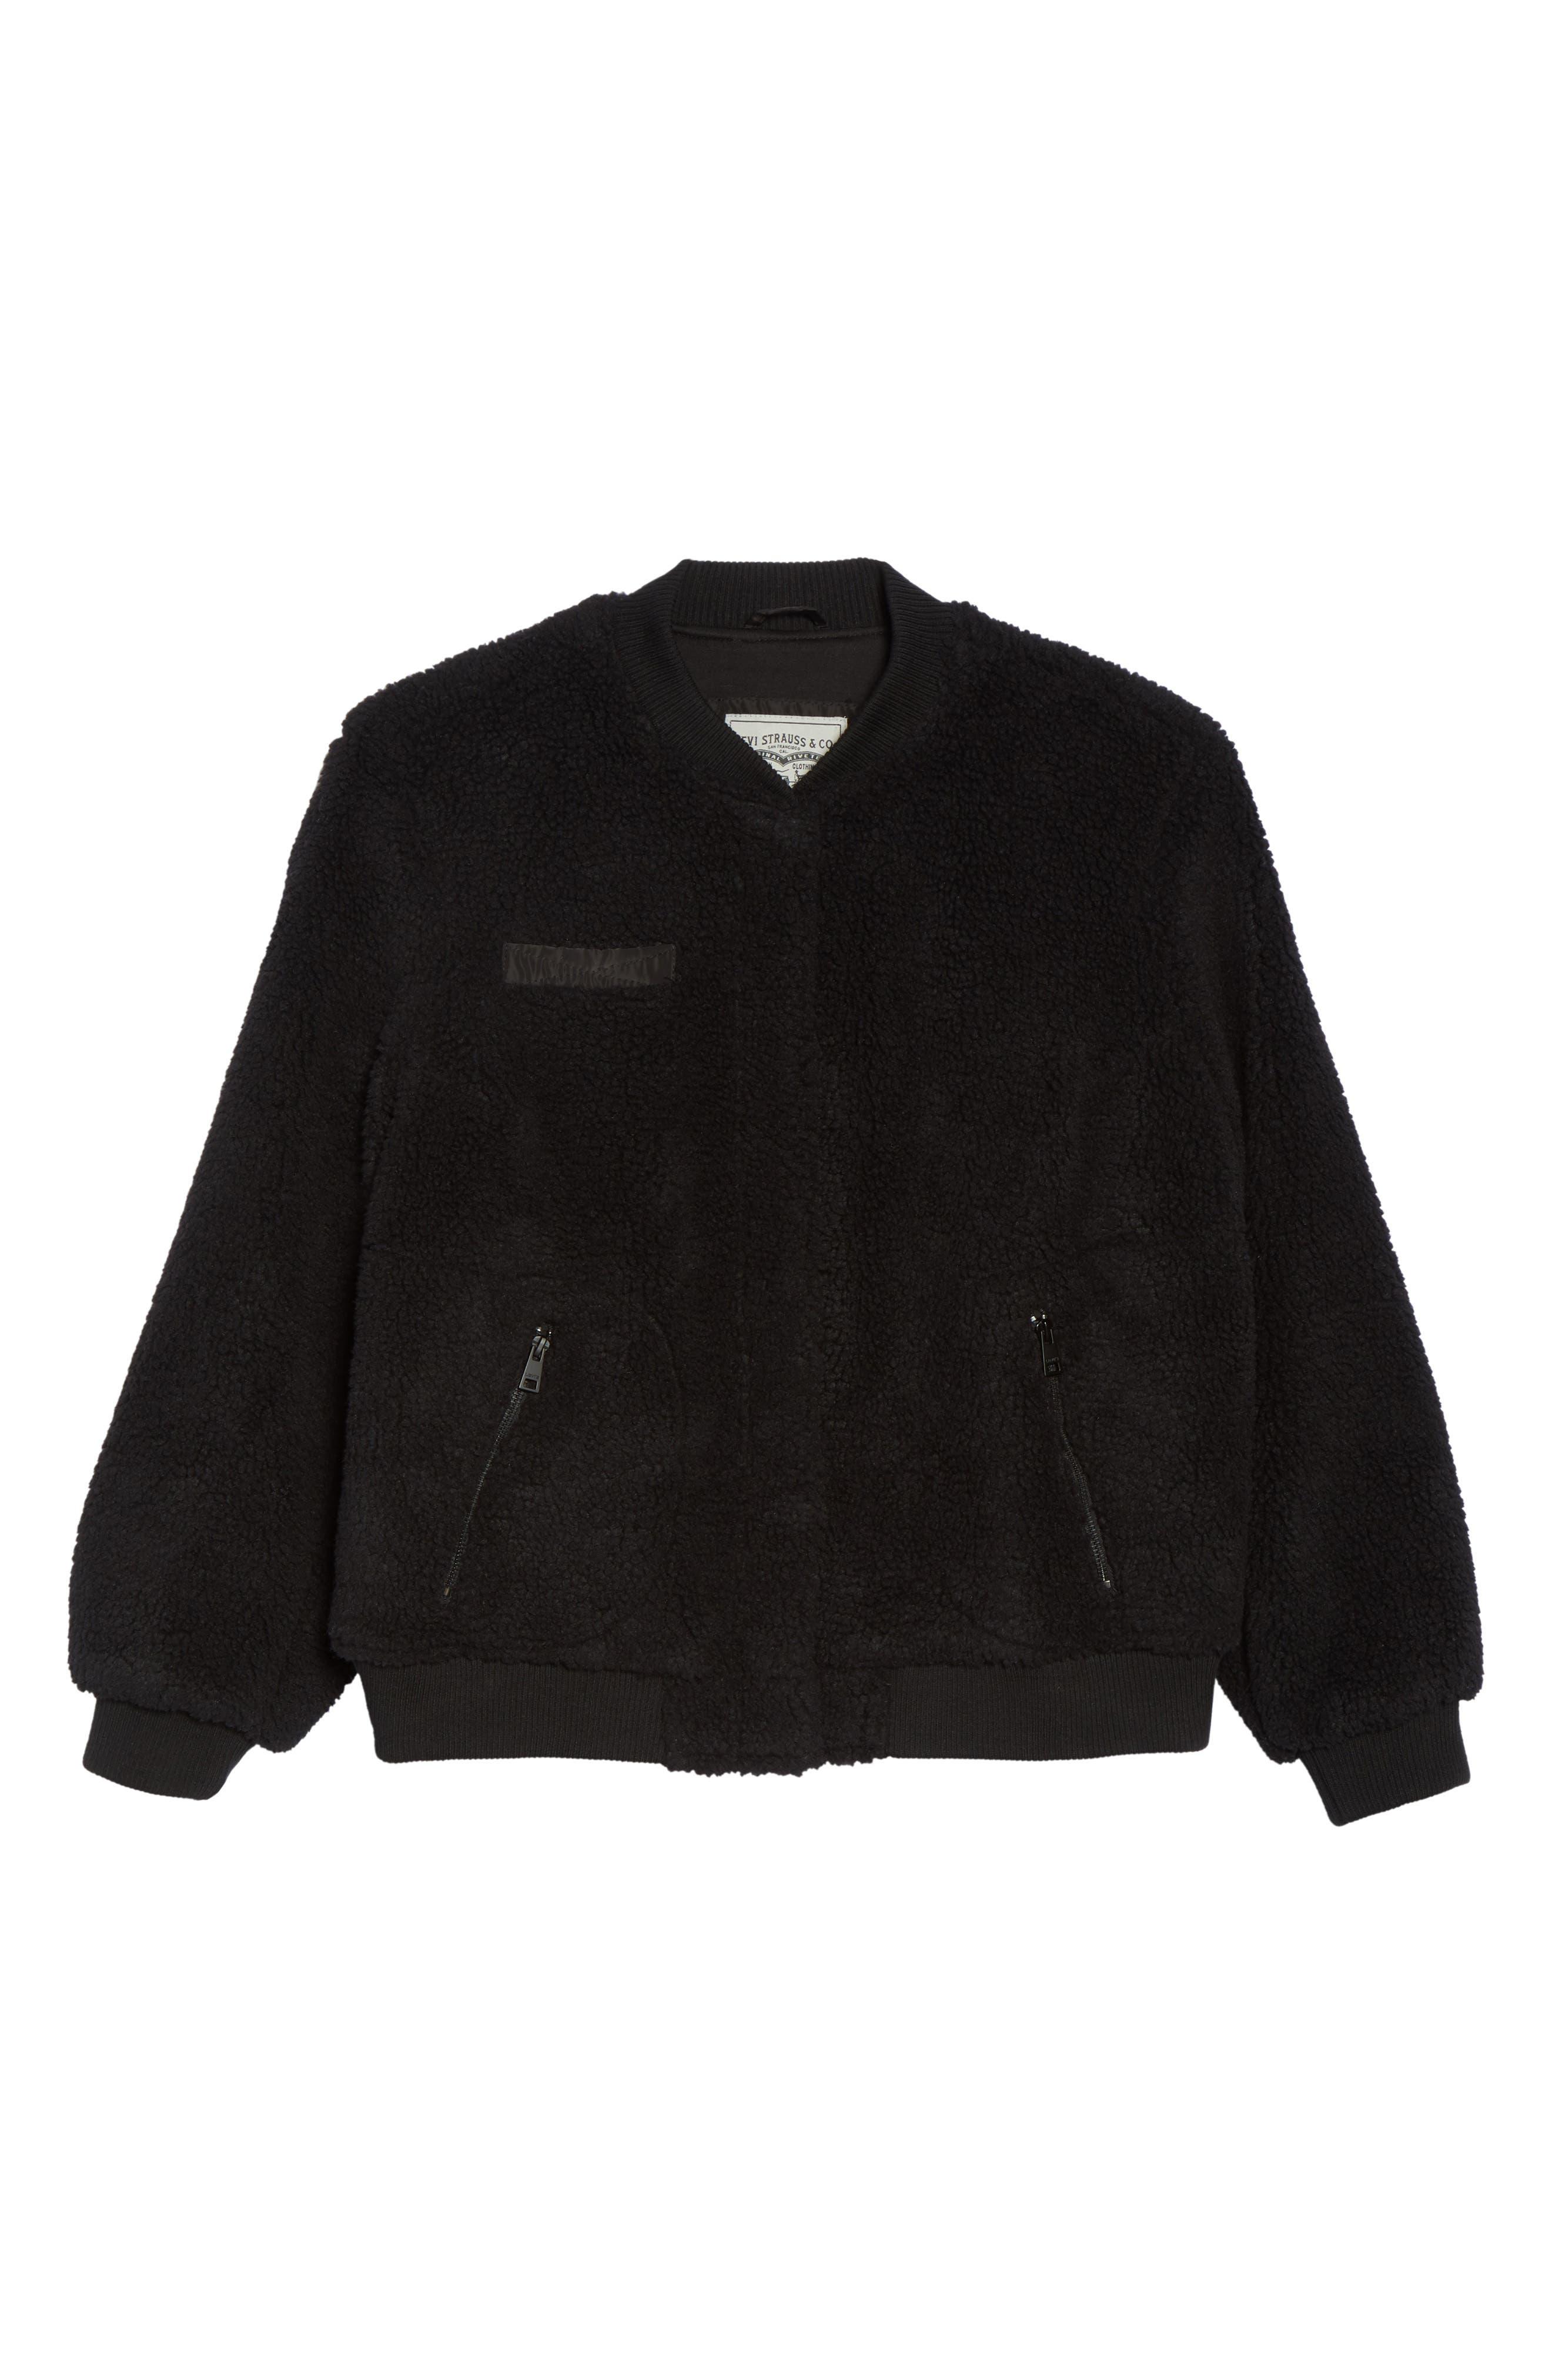 Rib Knit Fleece Bomber Jacket,                             Alternate thumbnail 6, color,                             Black